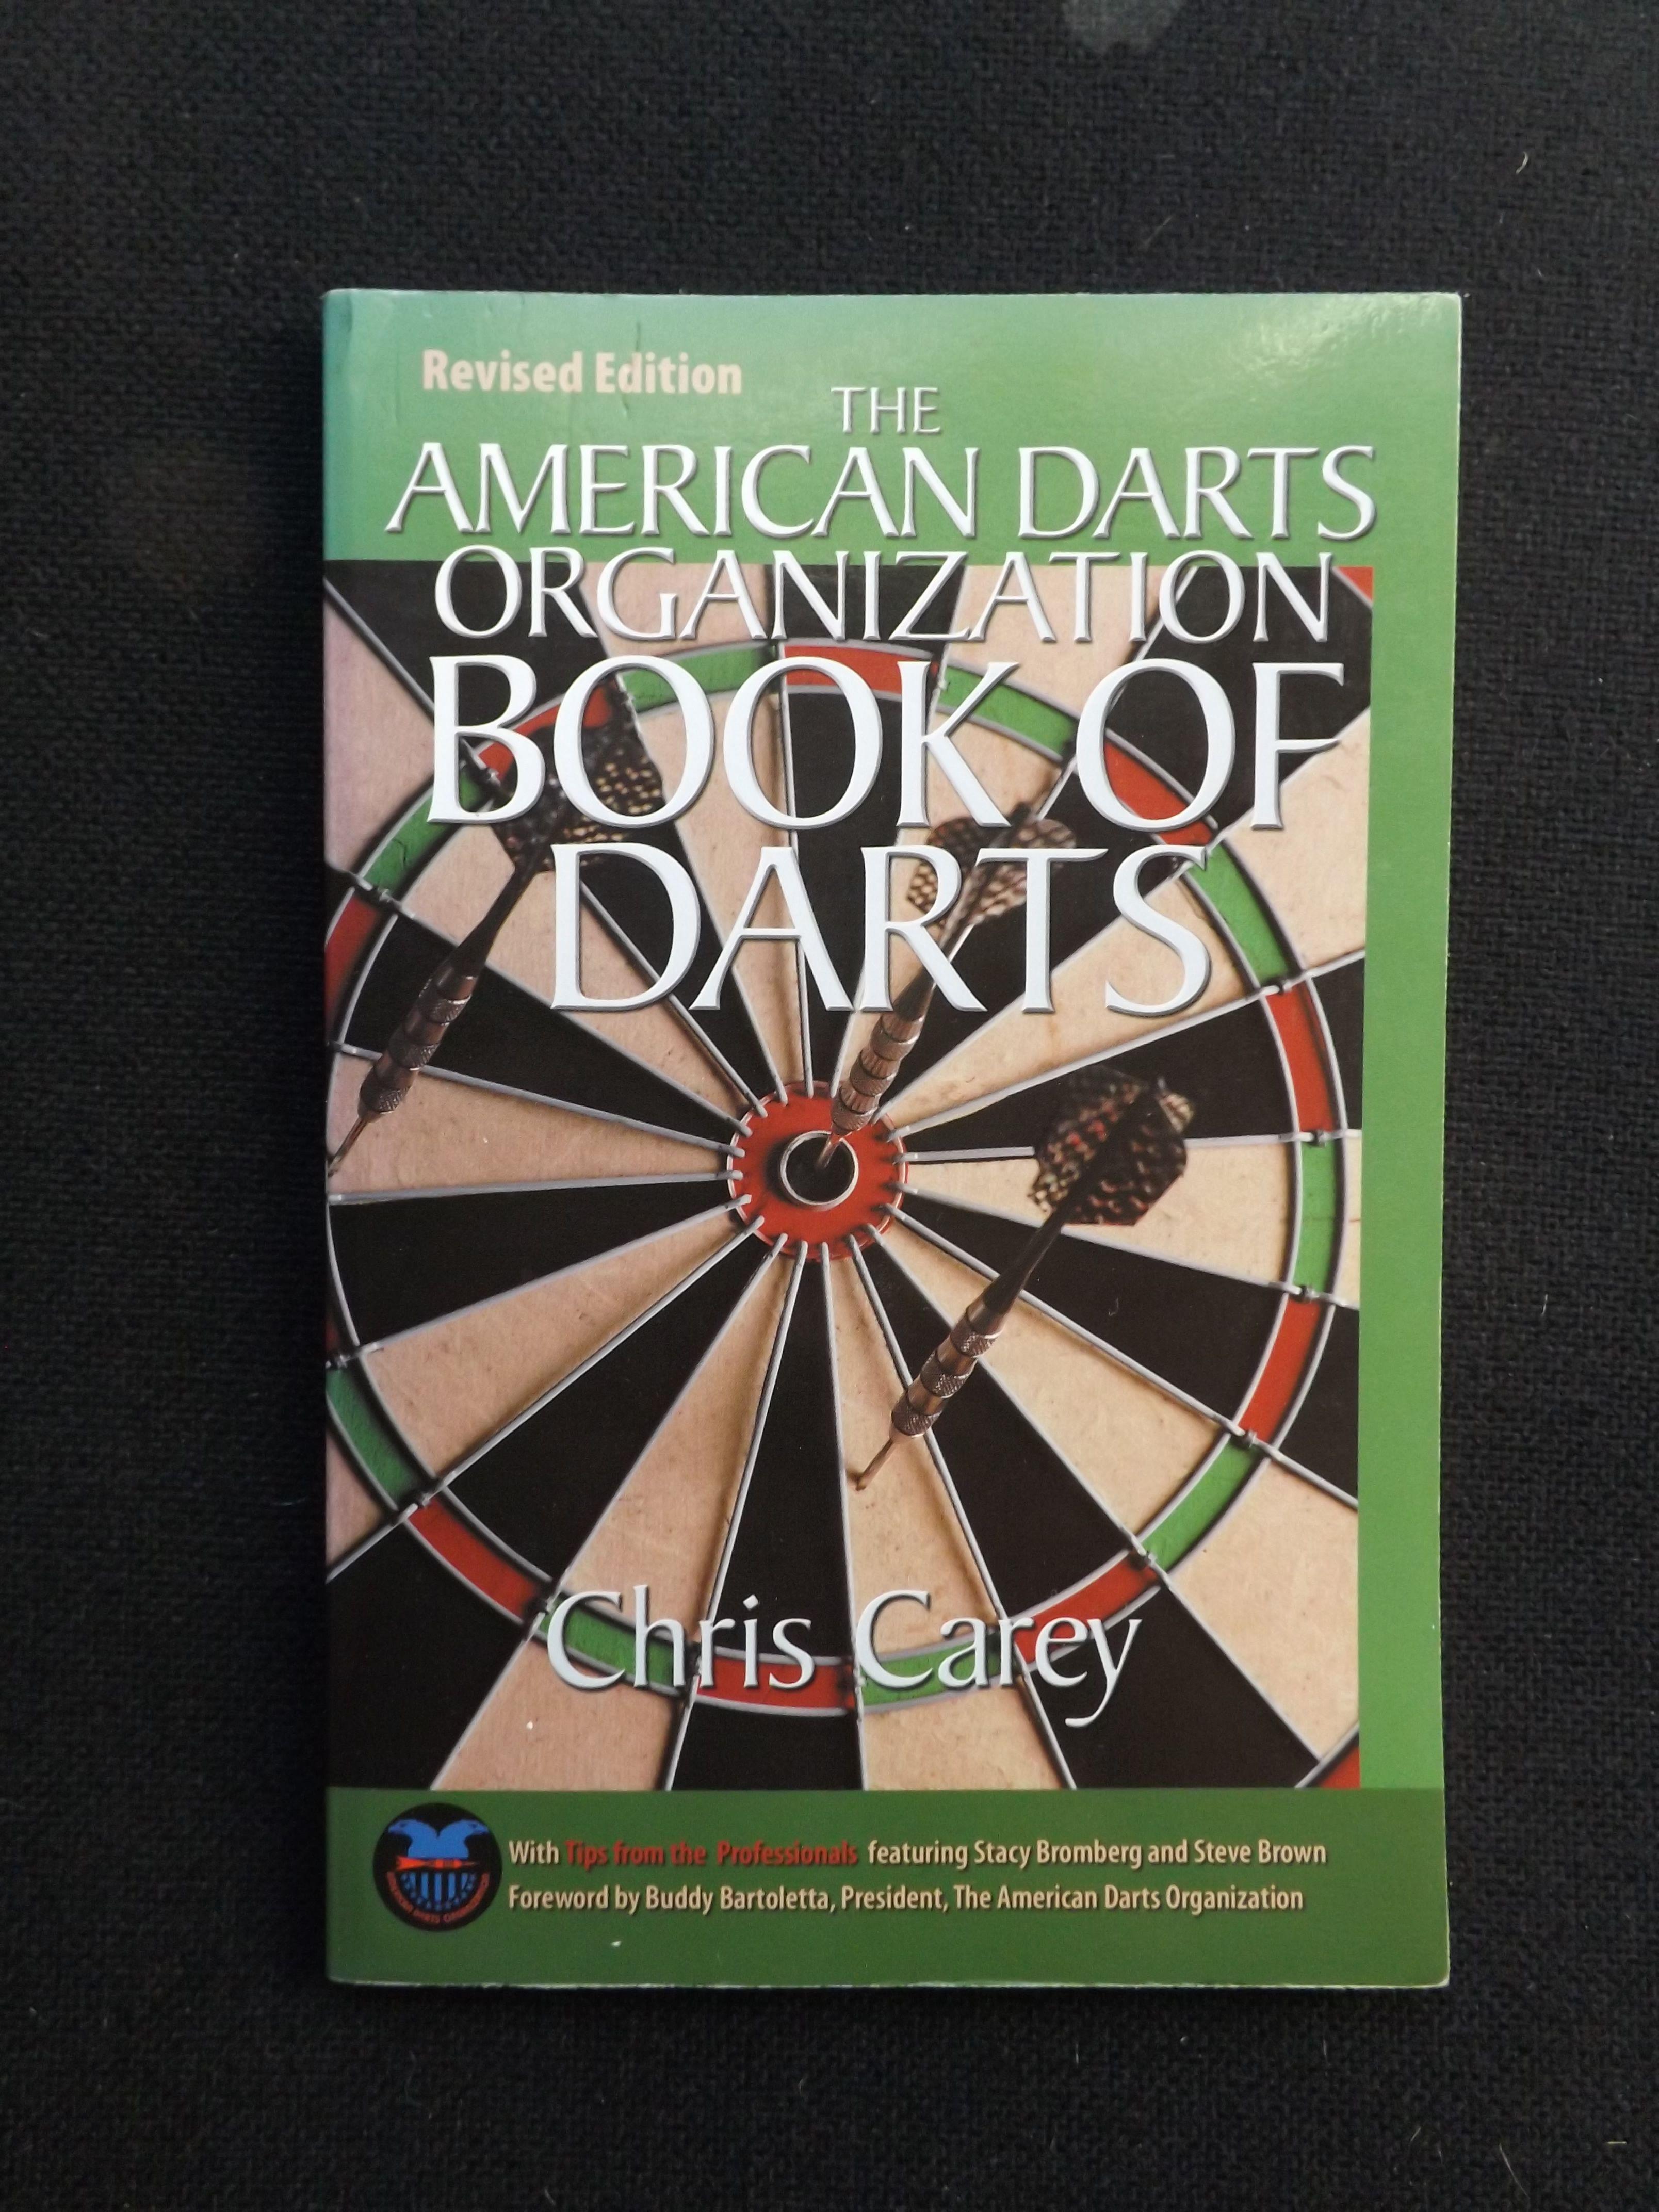 The ADO Book of Darts 2005 Darts, Book organization, Books